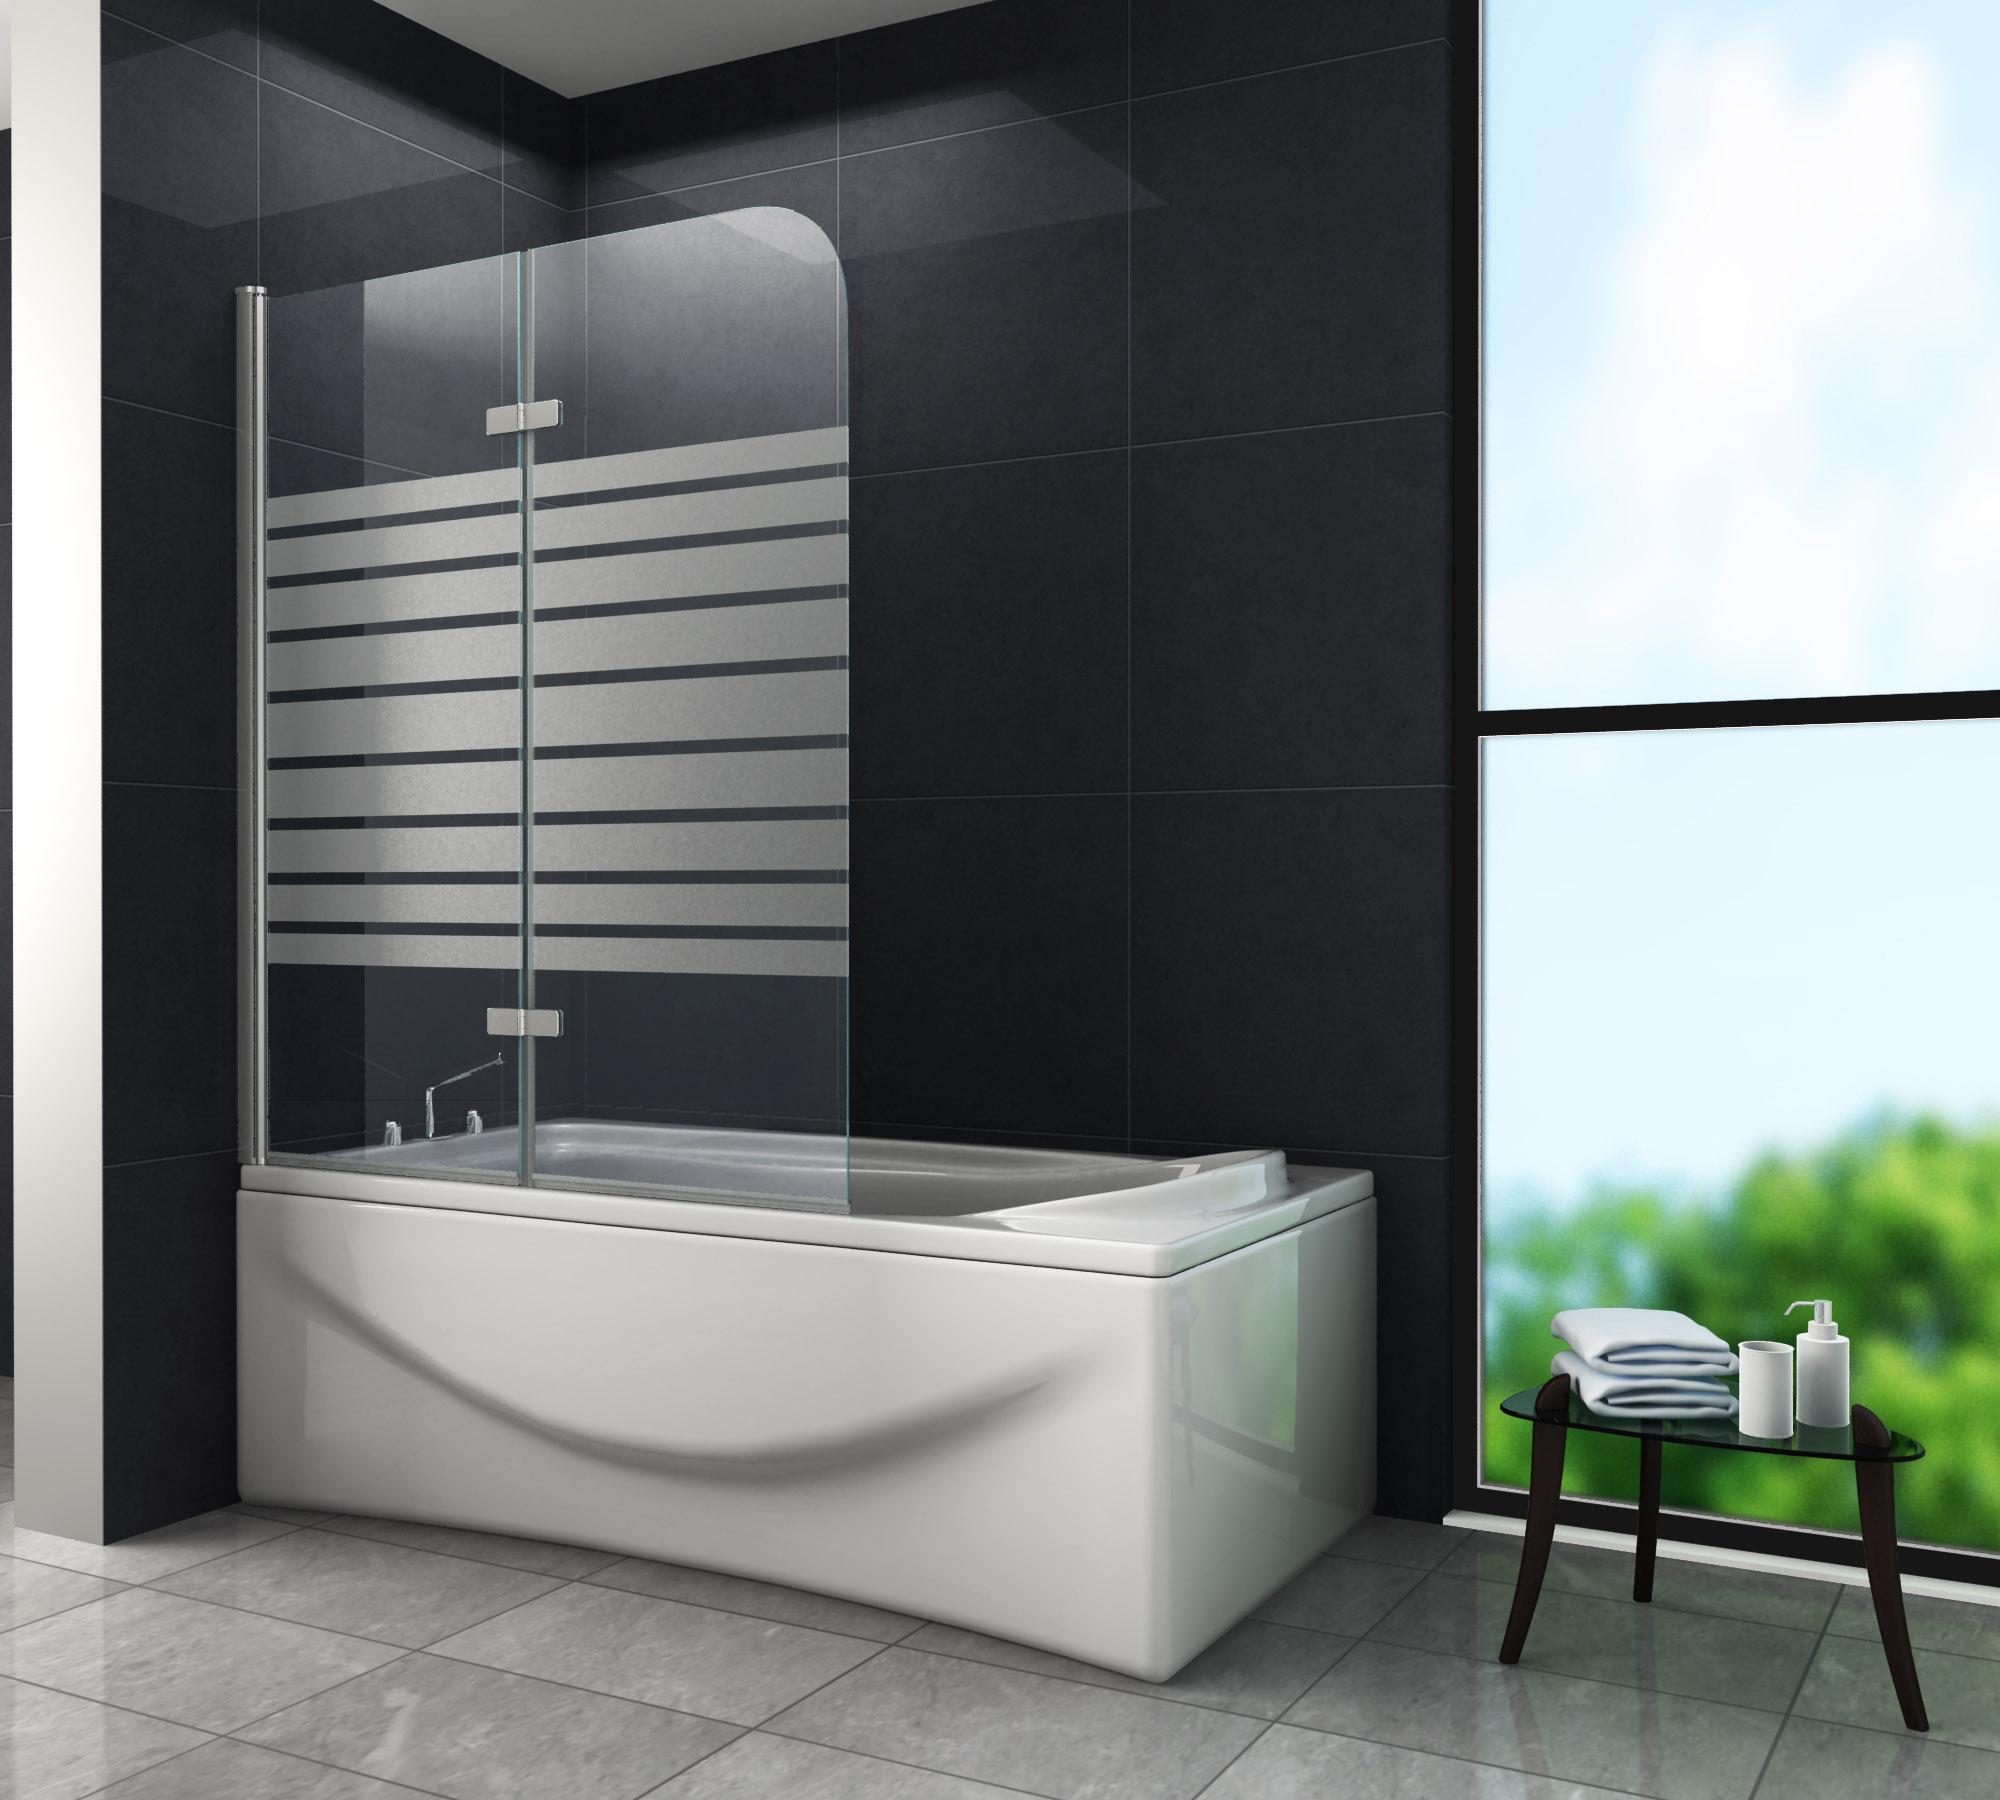 Duschtrennwand BREASE-FROST 100 x 140 (Badewanne)